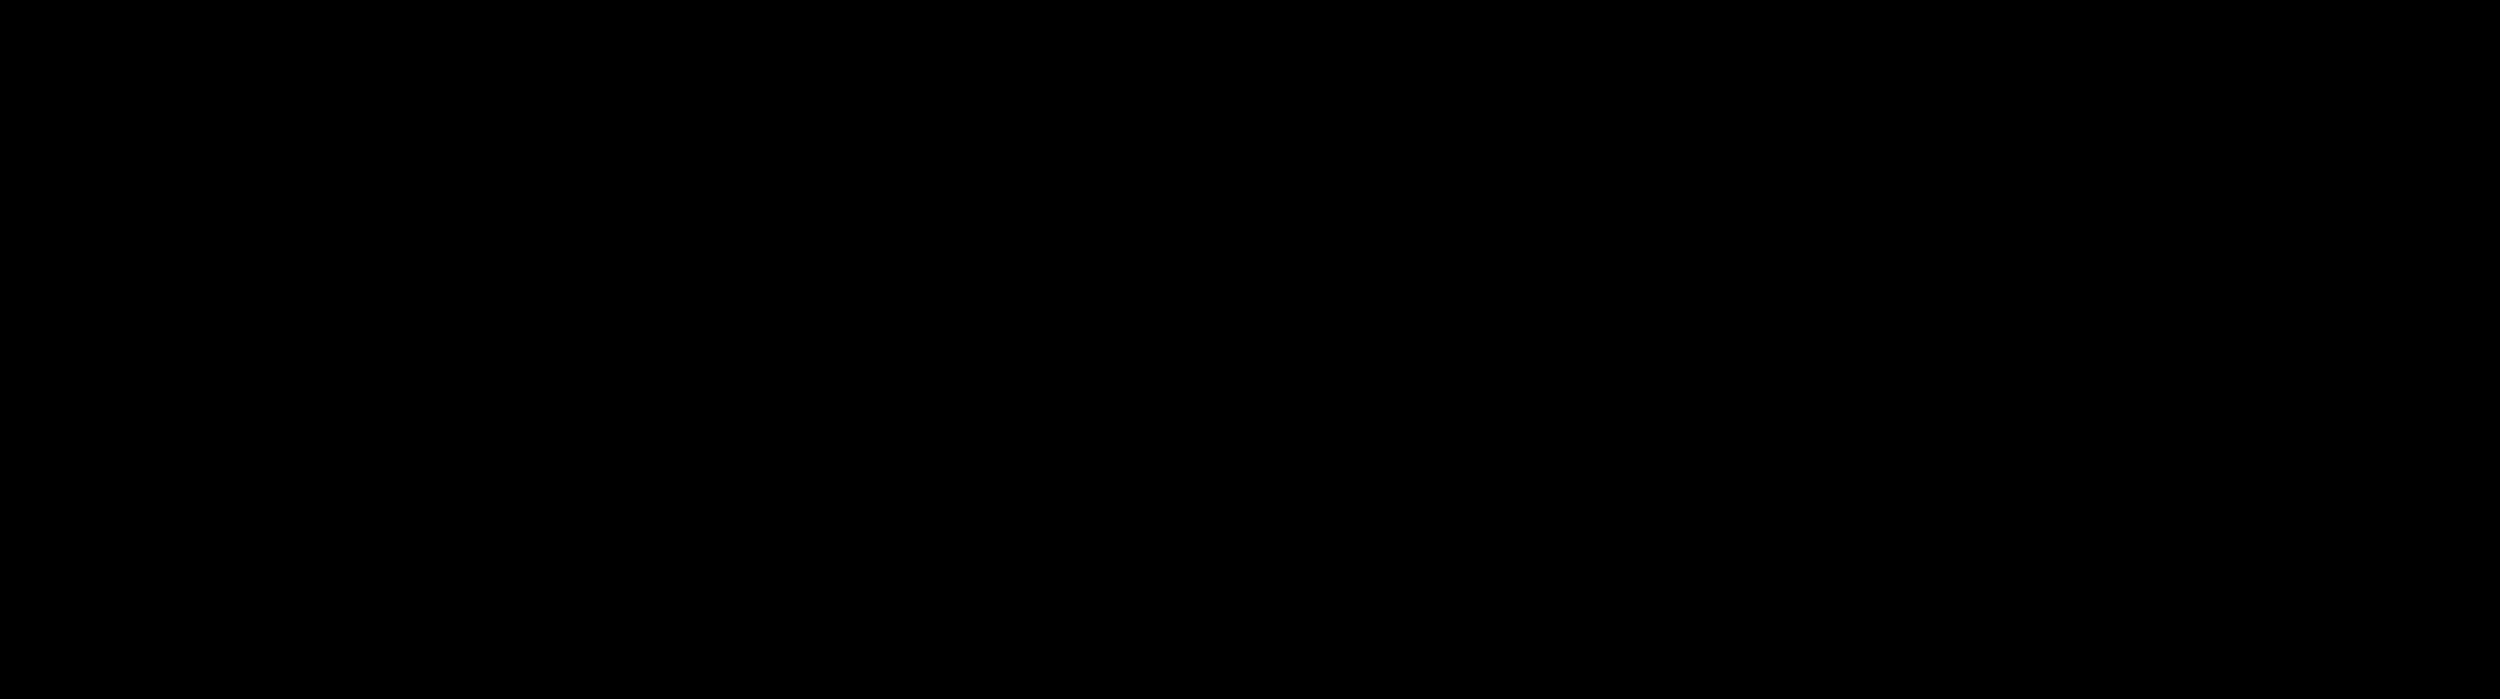 Logo margin.png